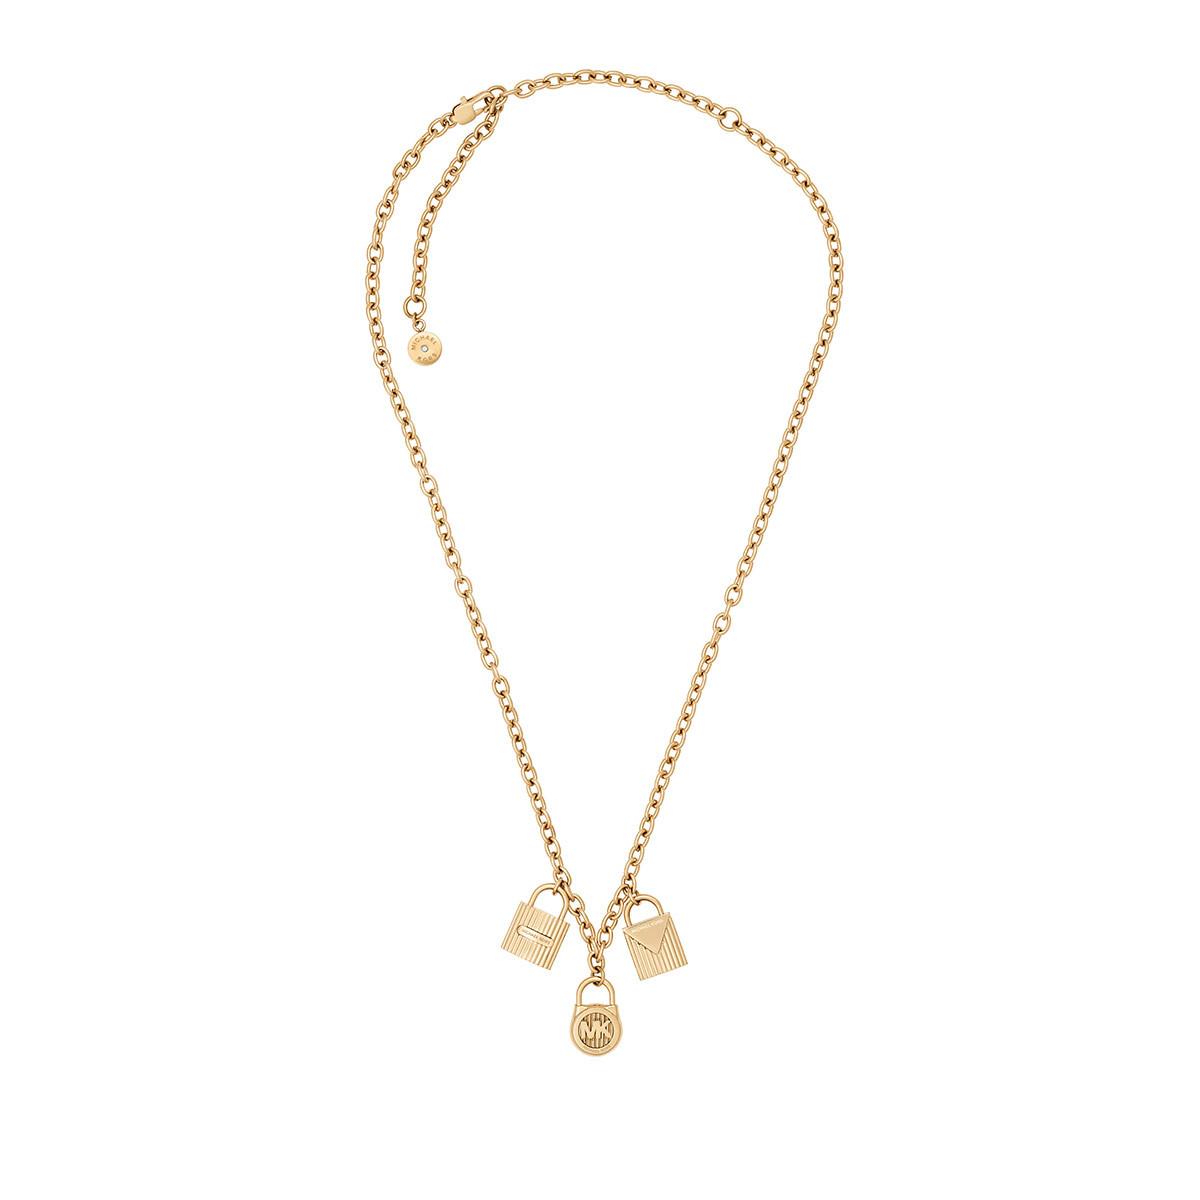 jW41SrbbzN Sieraden - Logo Lock Trinket Necklace goud in goud voor dames Klaring Order Comfortabele Online Te Koop 0kQU7